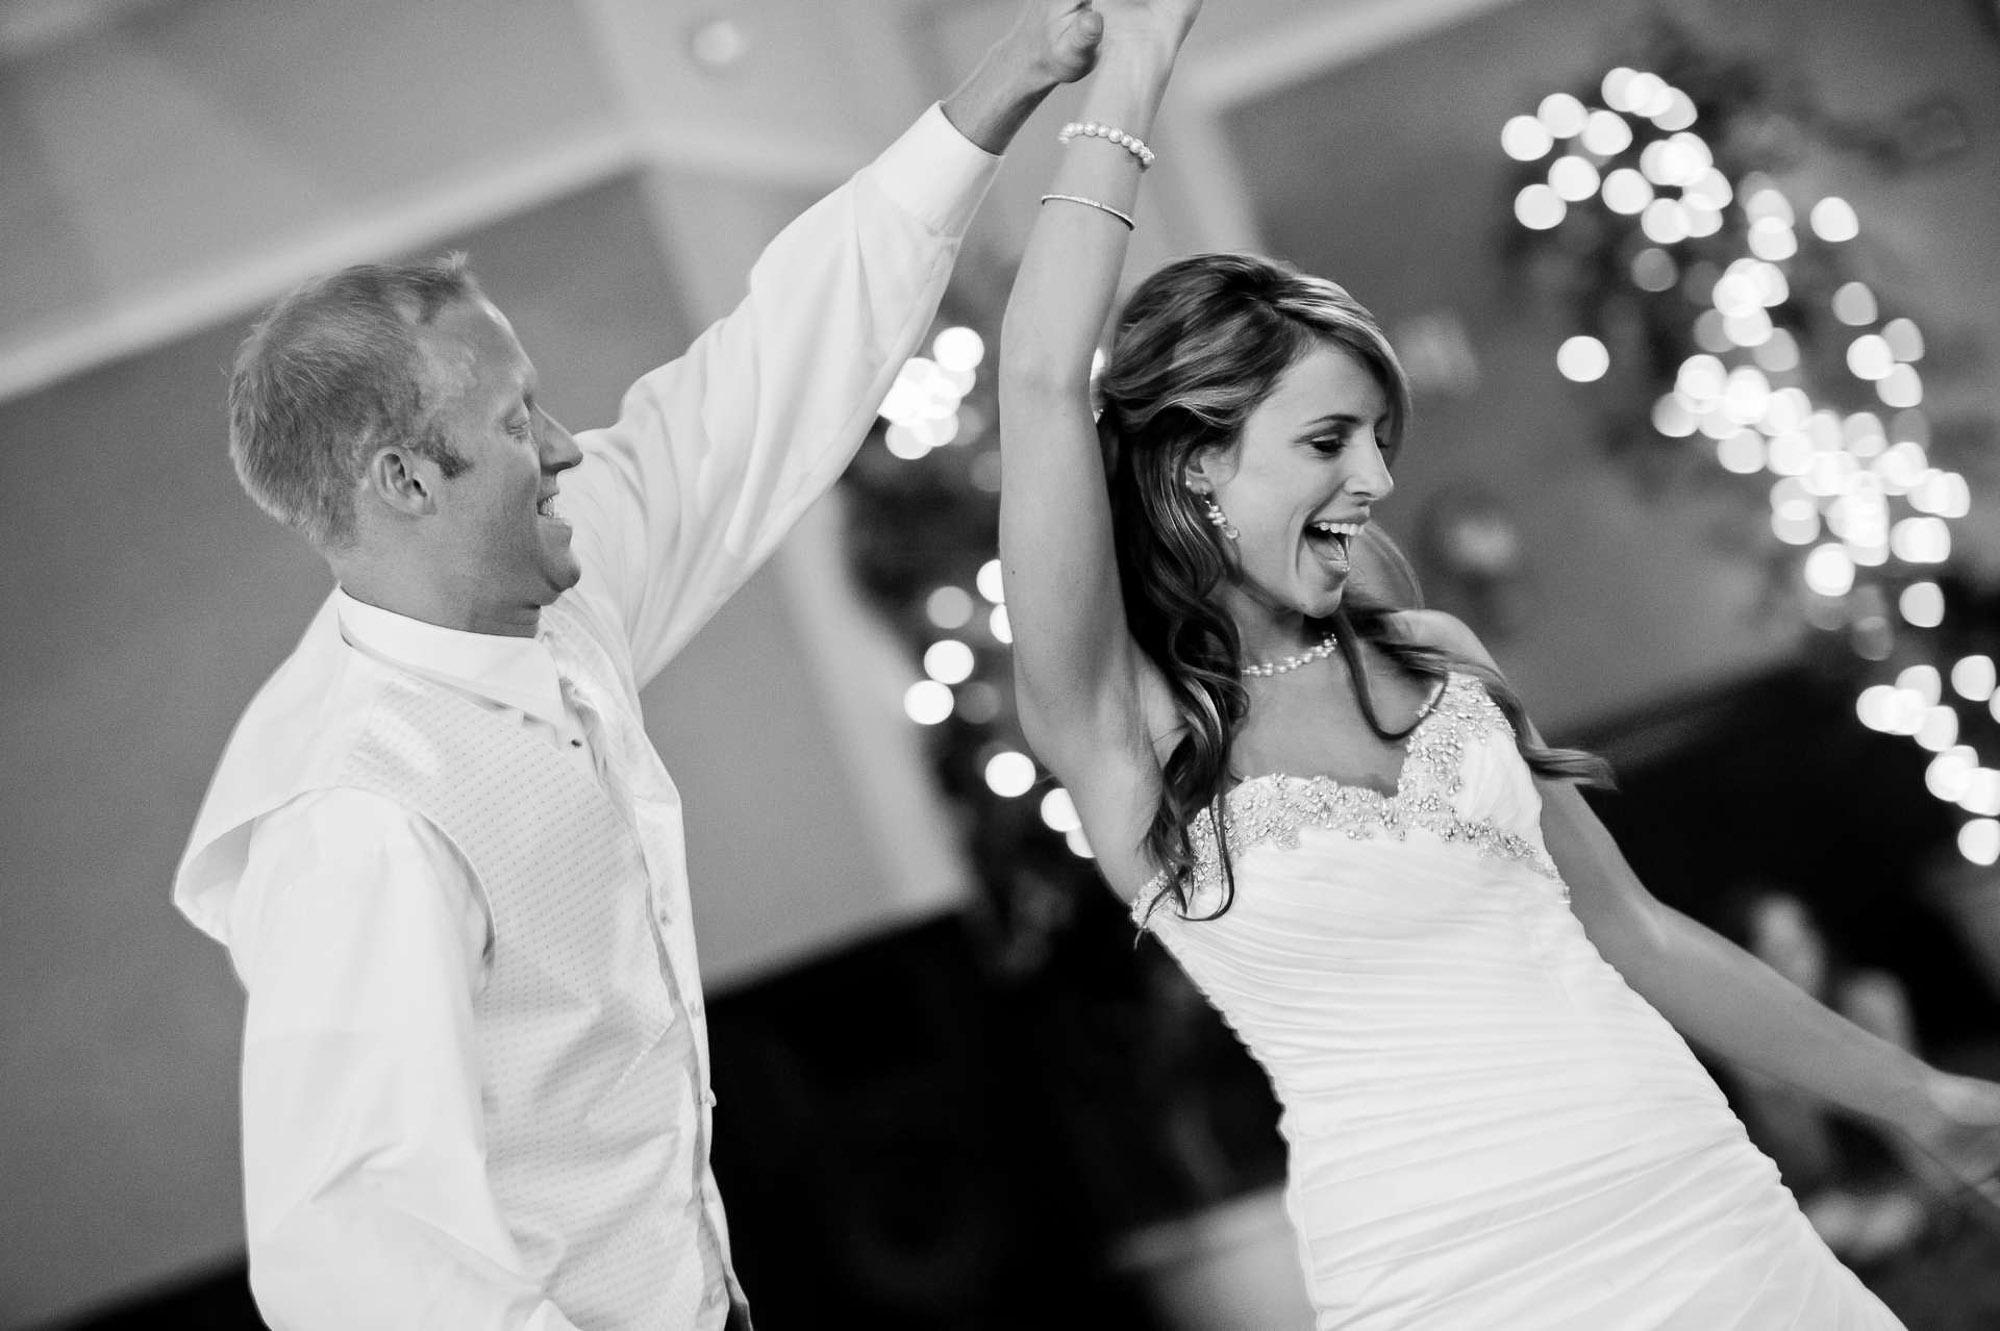 Braut mit Bräutigam tanzen